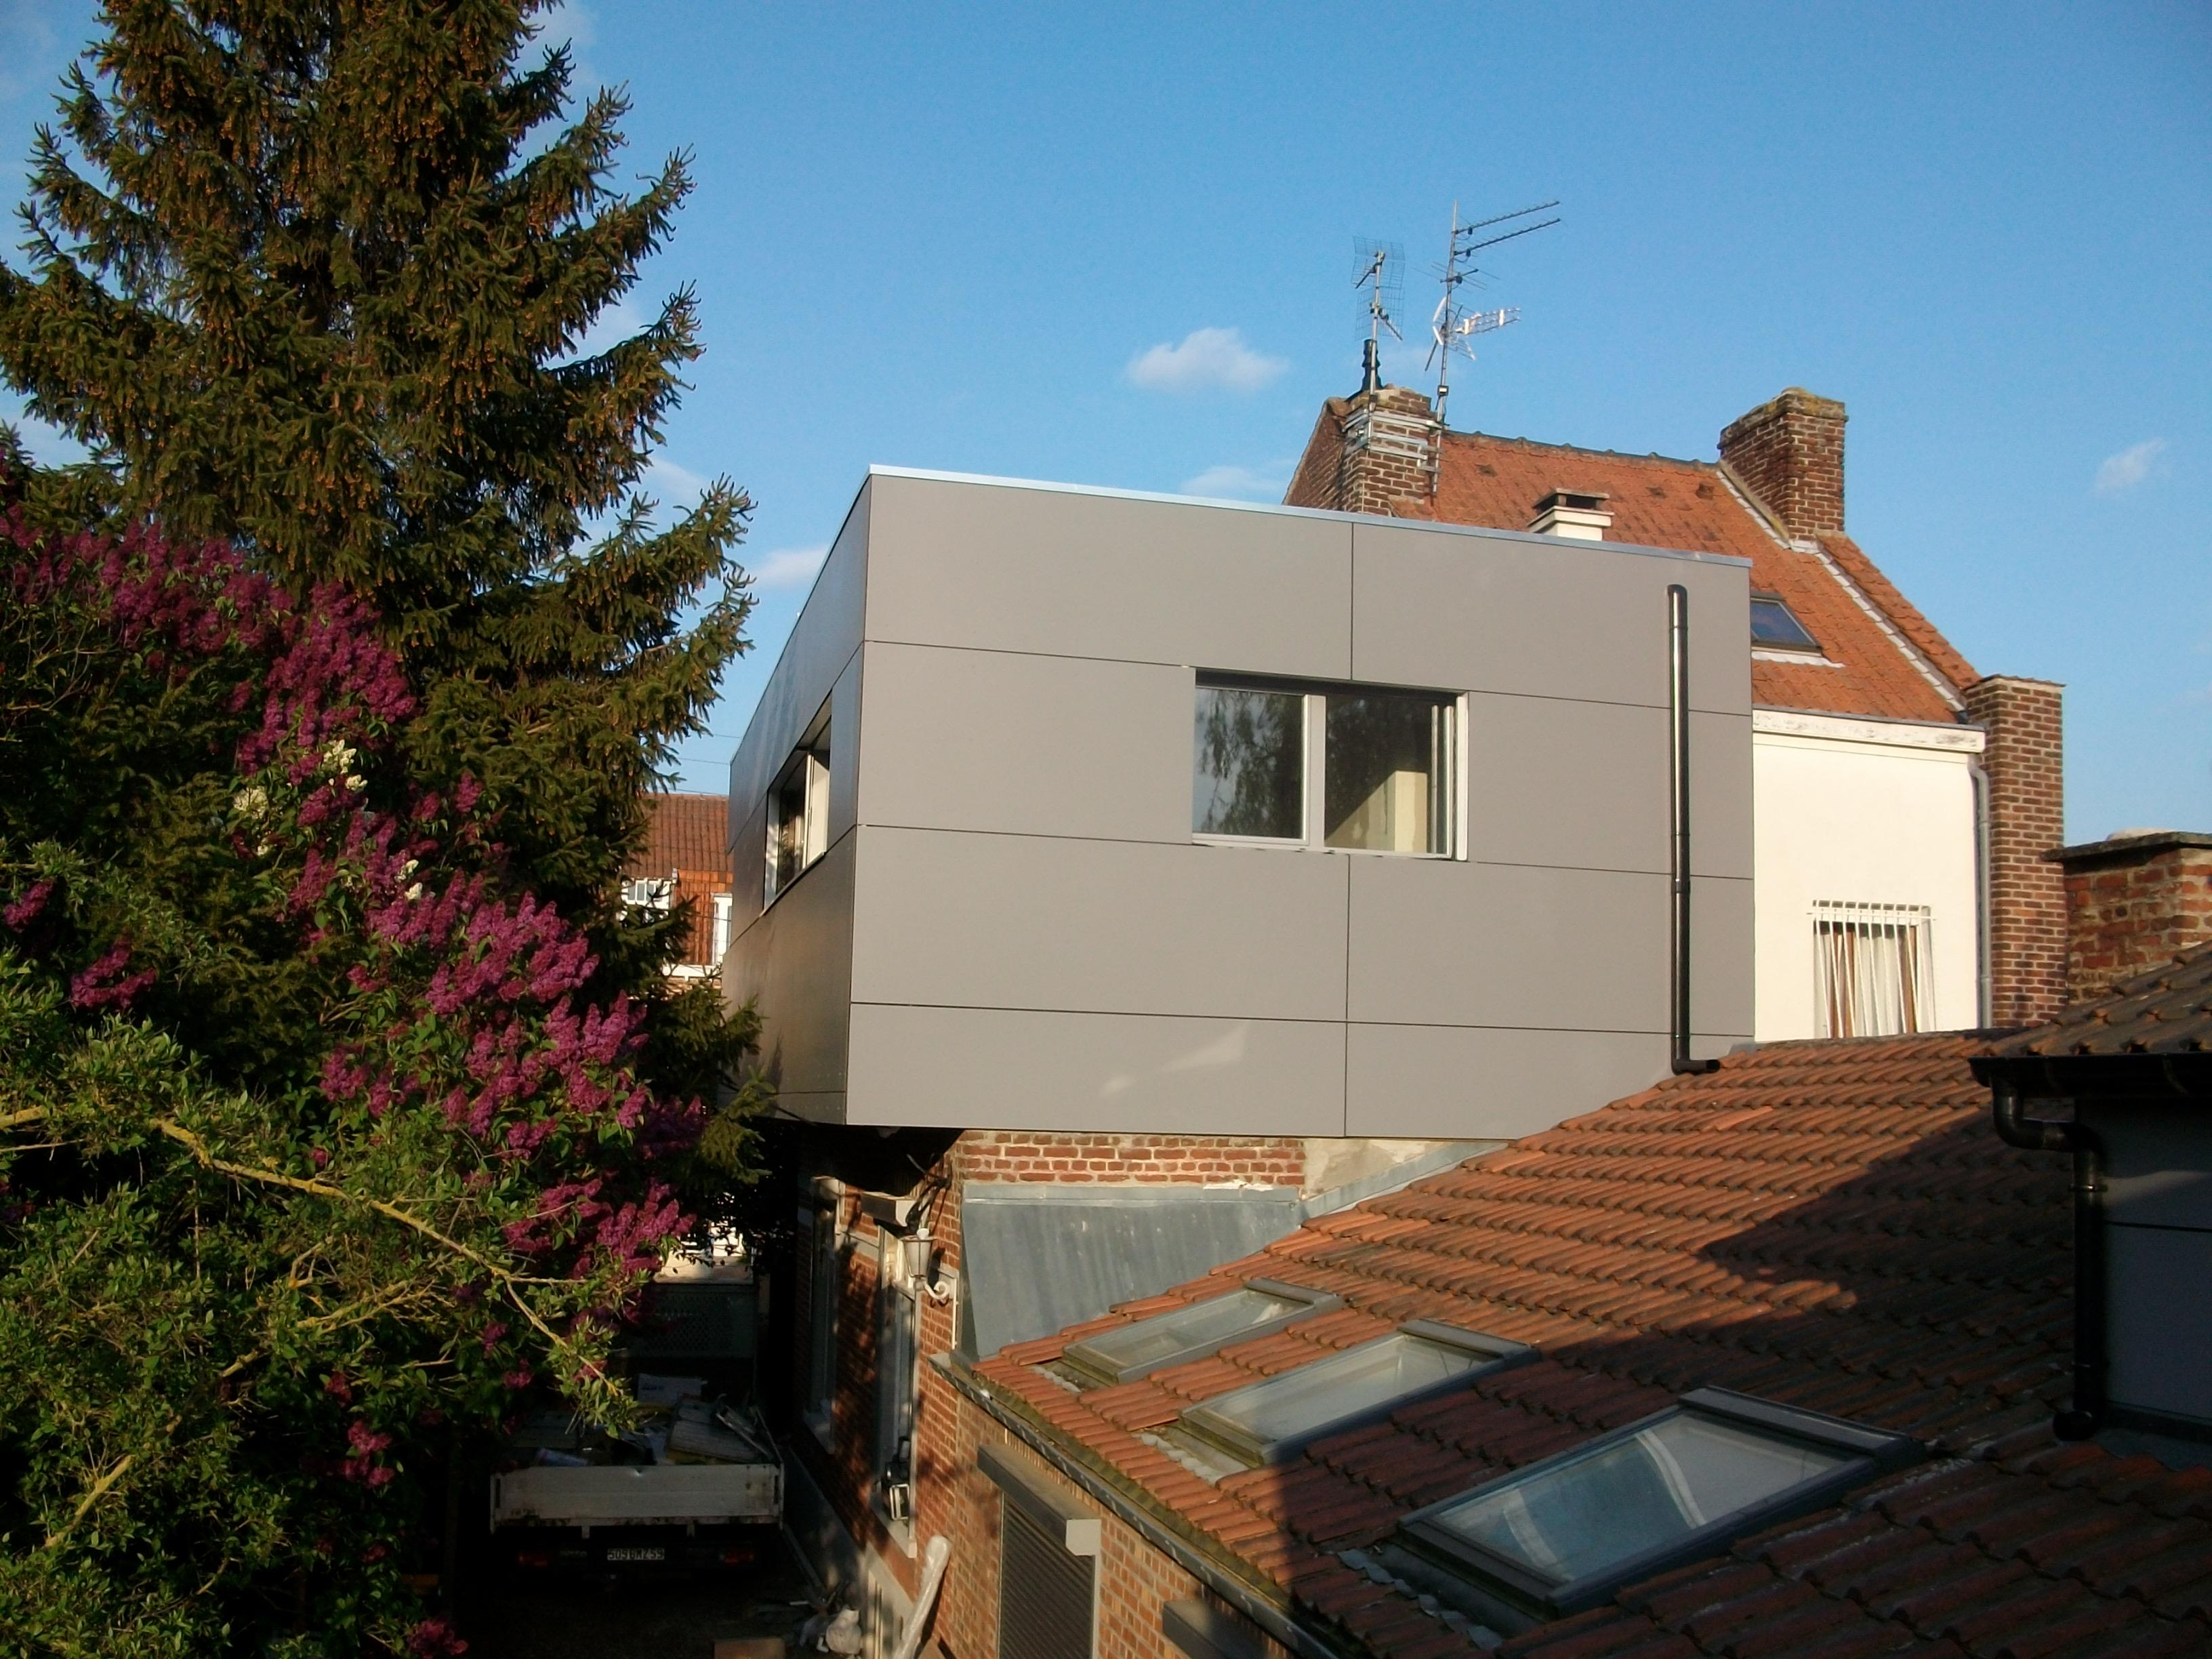 agrandir sa maison en ossature bois ventana blog. Black Bedroom Furniture Sets. Home Design Ideas